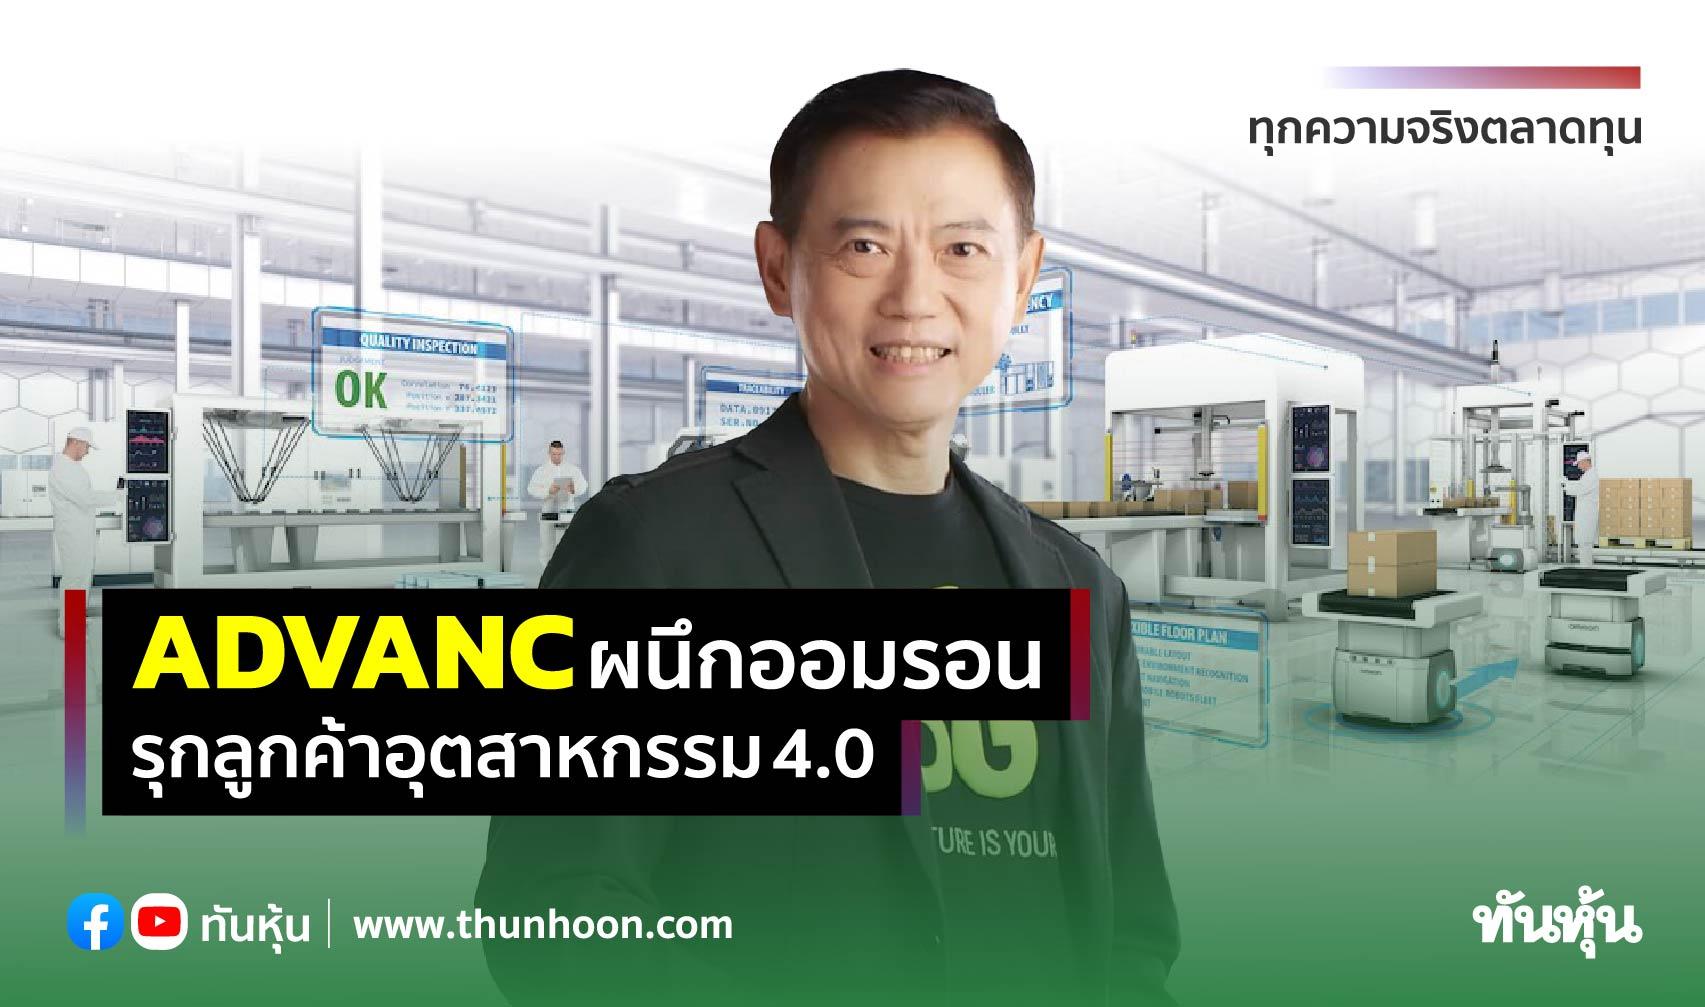 ADVANCผนึกออมรอน รุกลูกค้าอุตสาหกรรม4.0